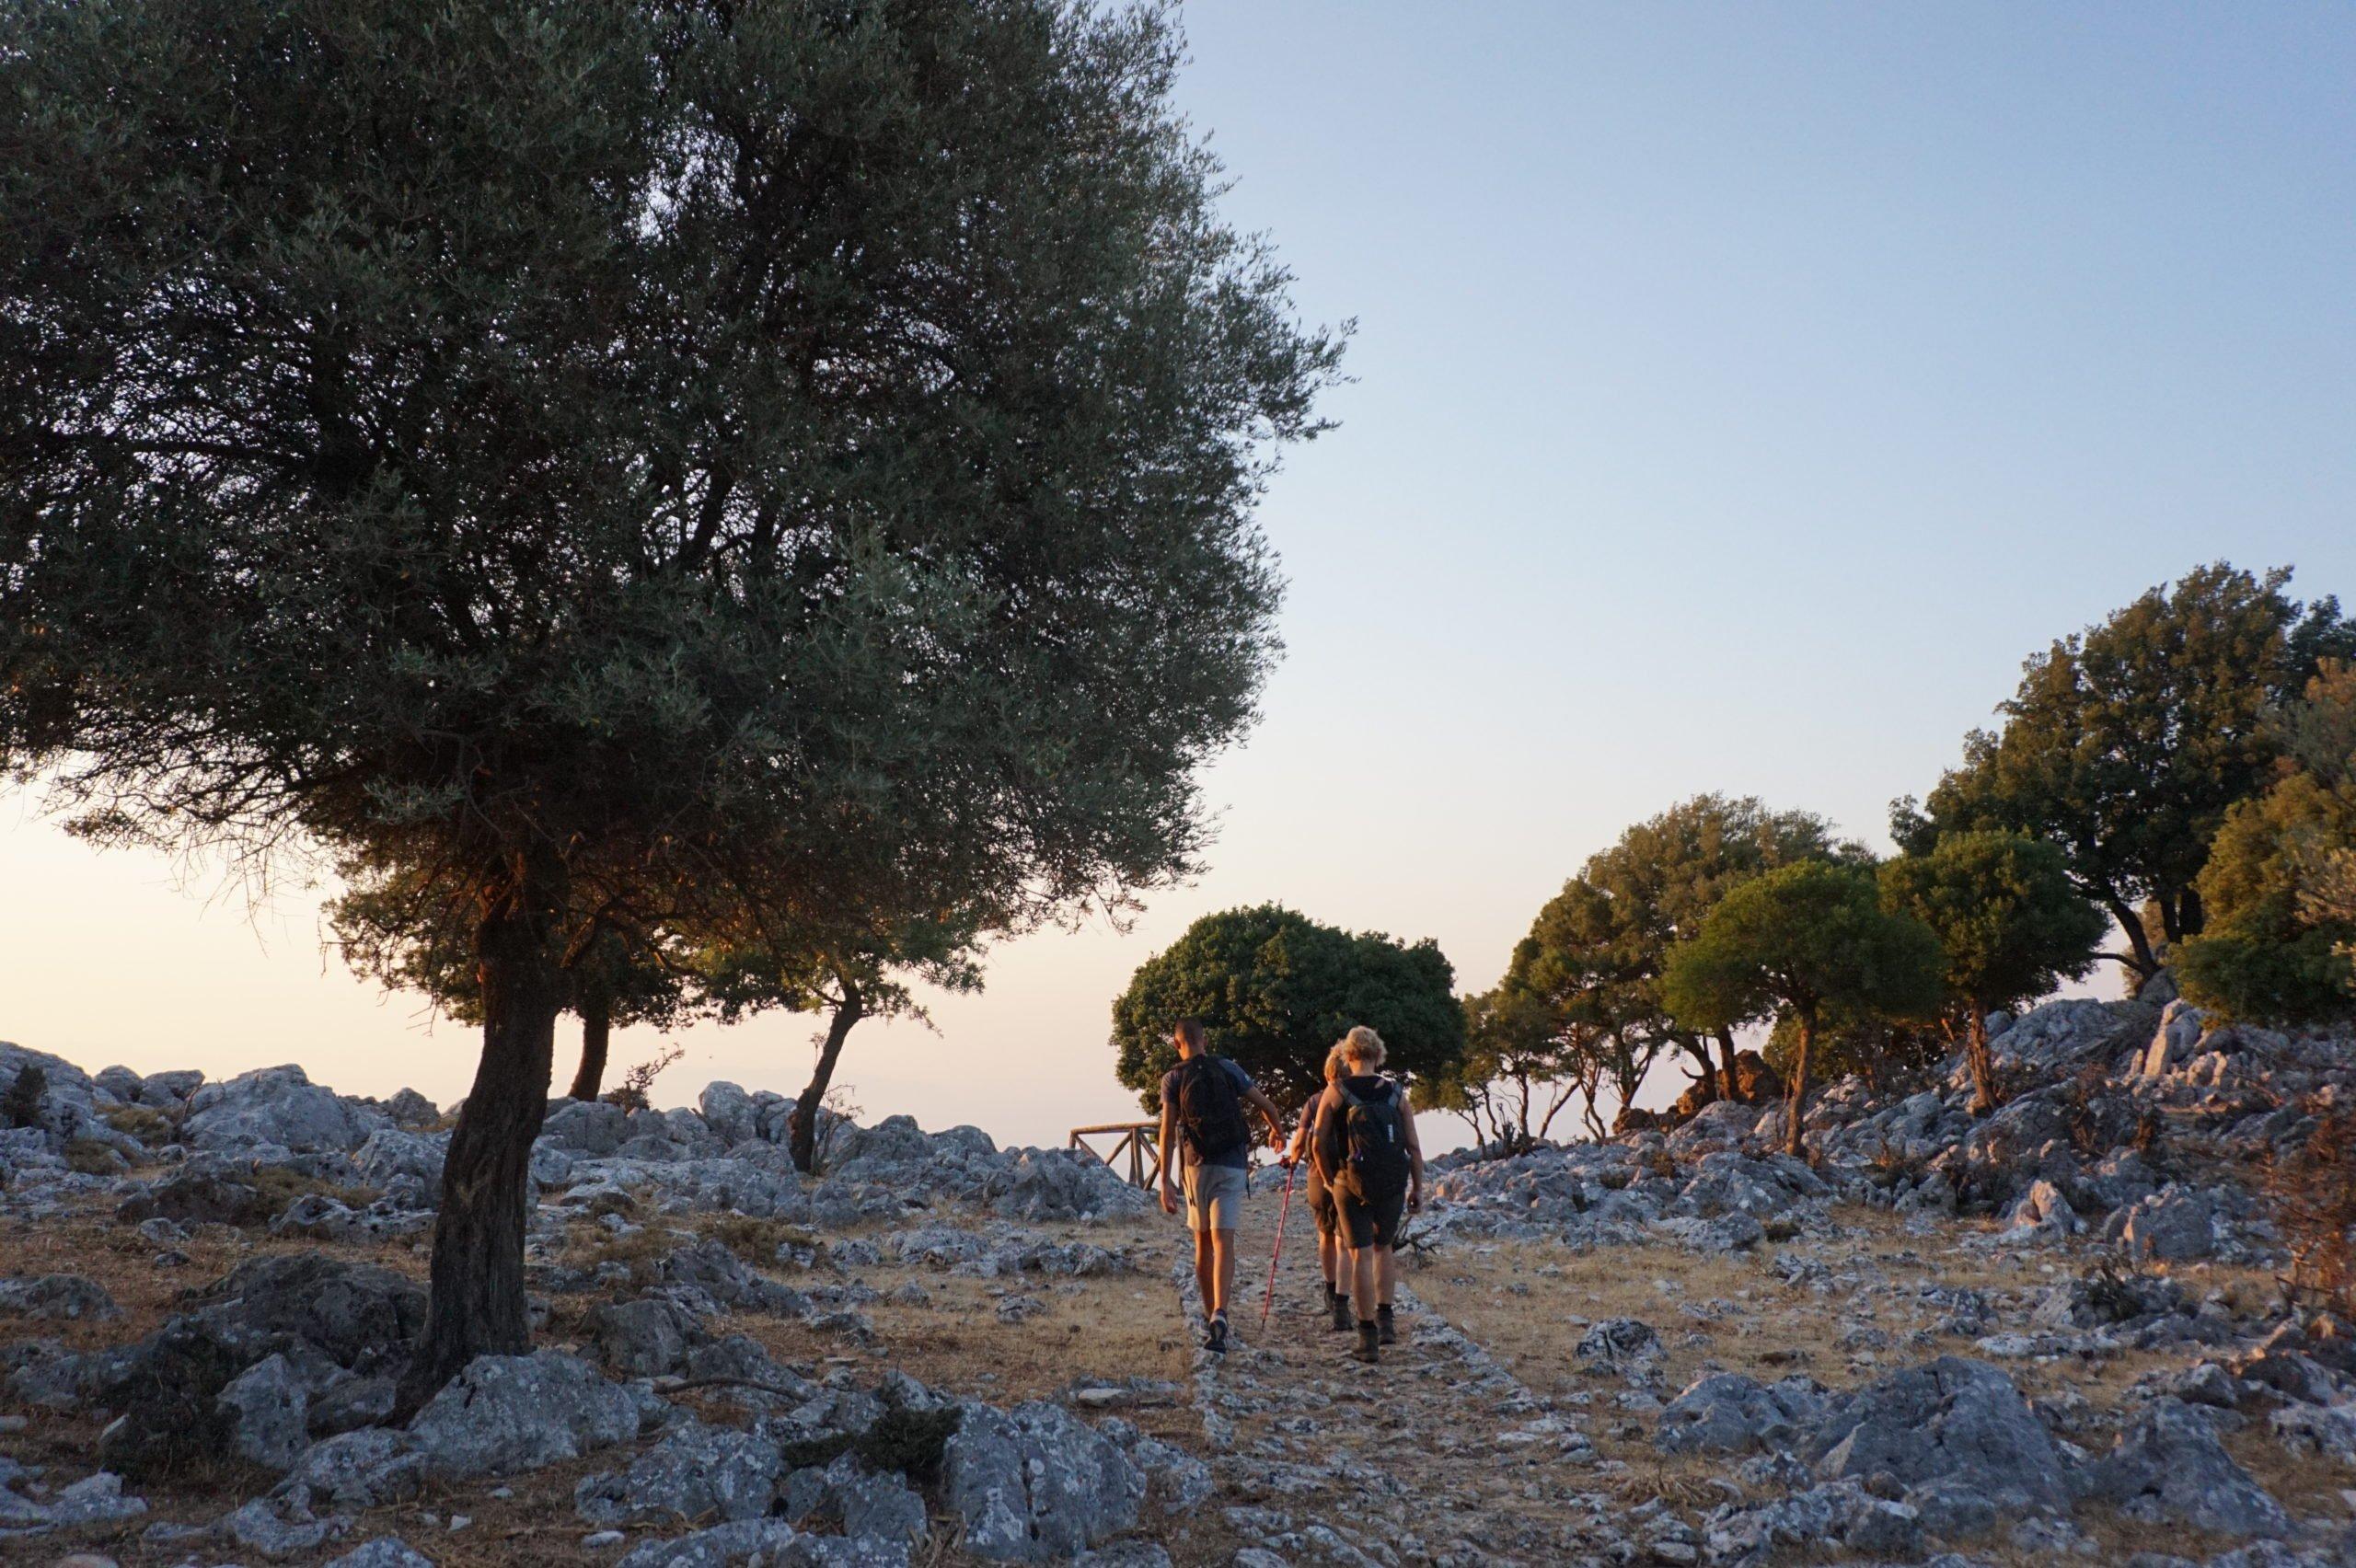 Explore The Third Biggest Mountain Of The Island In Our Profitis Ilias Sunset Hiking Tour